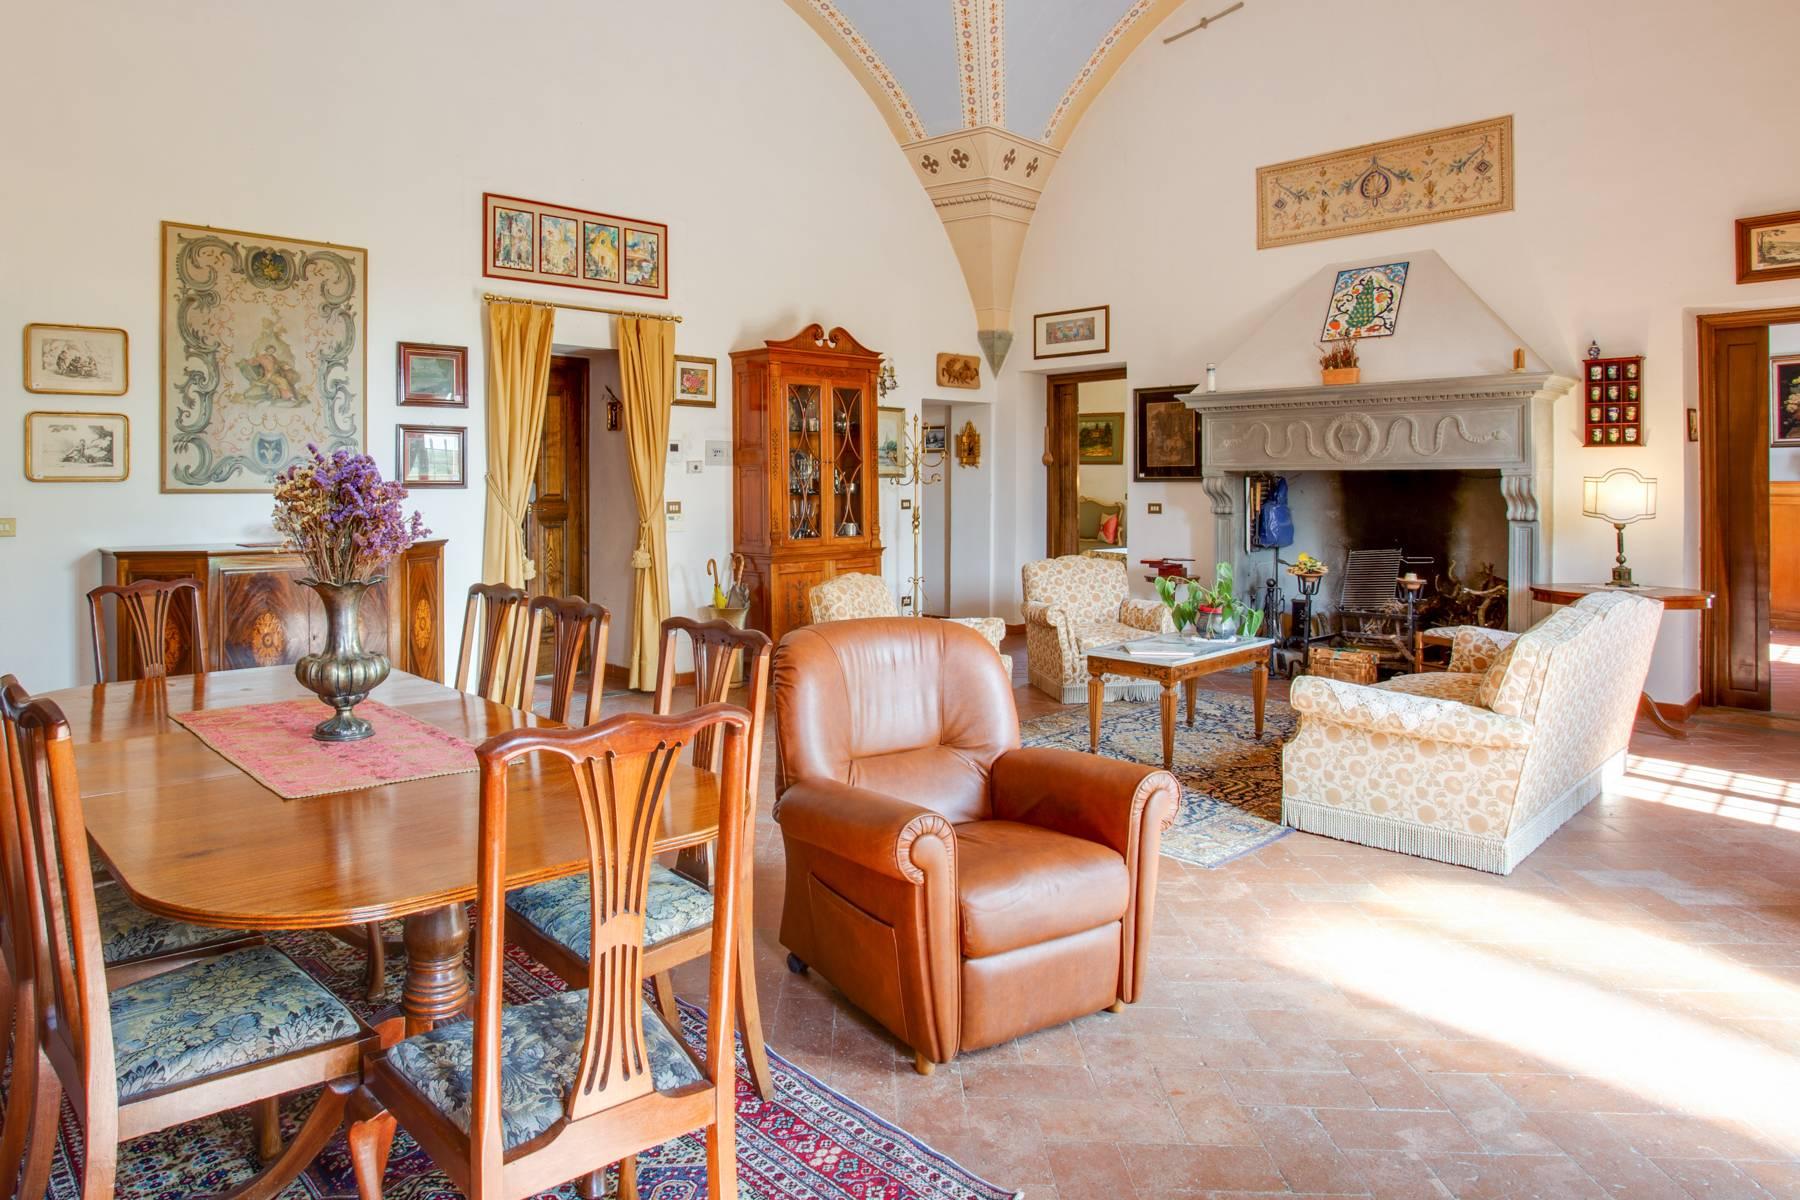 Appartamento in Vendita a Scandicci: 5 locali, 140 mq - Foto 4